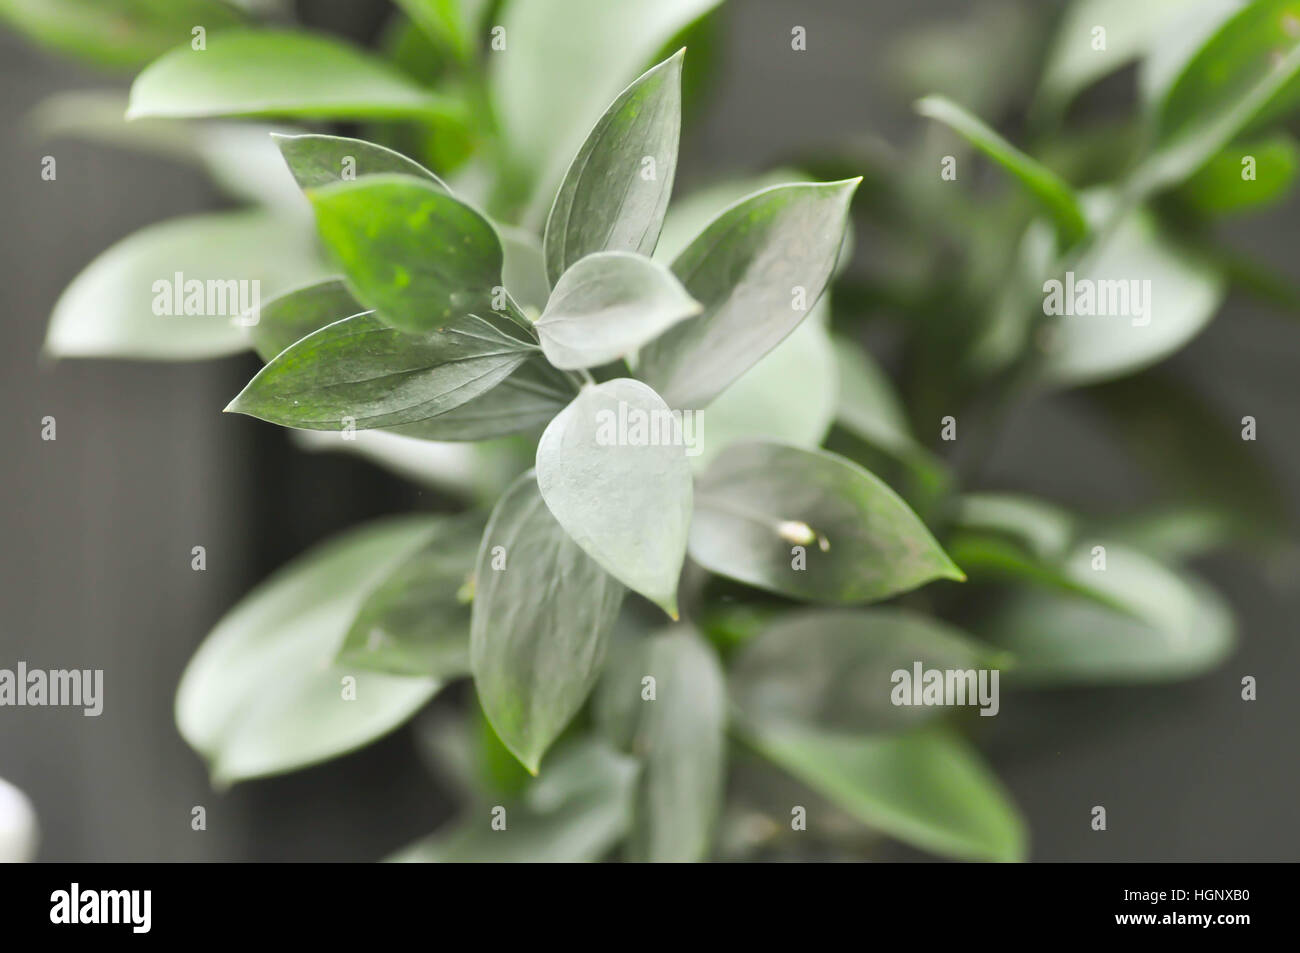 Israeli Ruscus Green Leaves